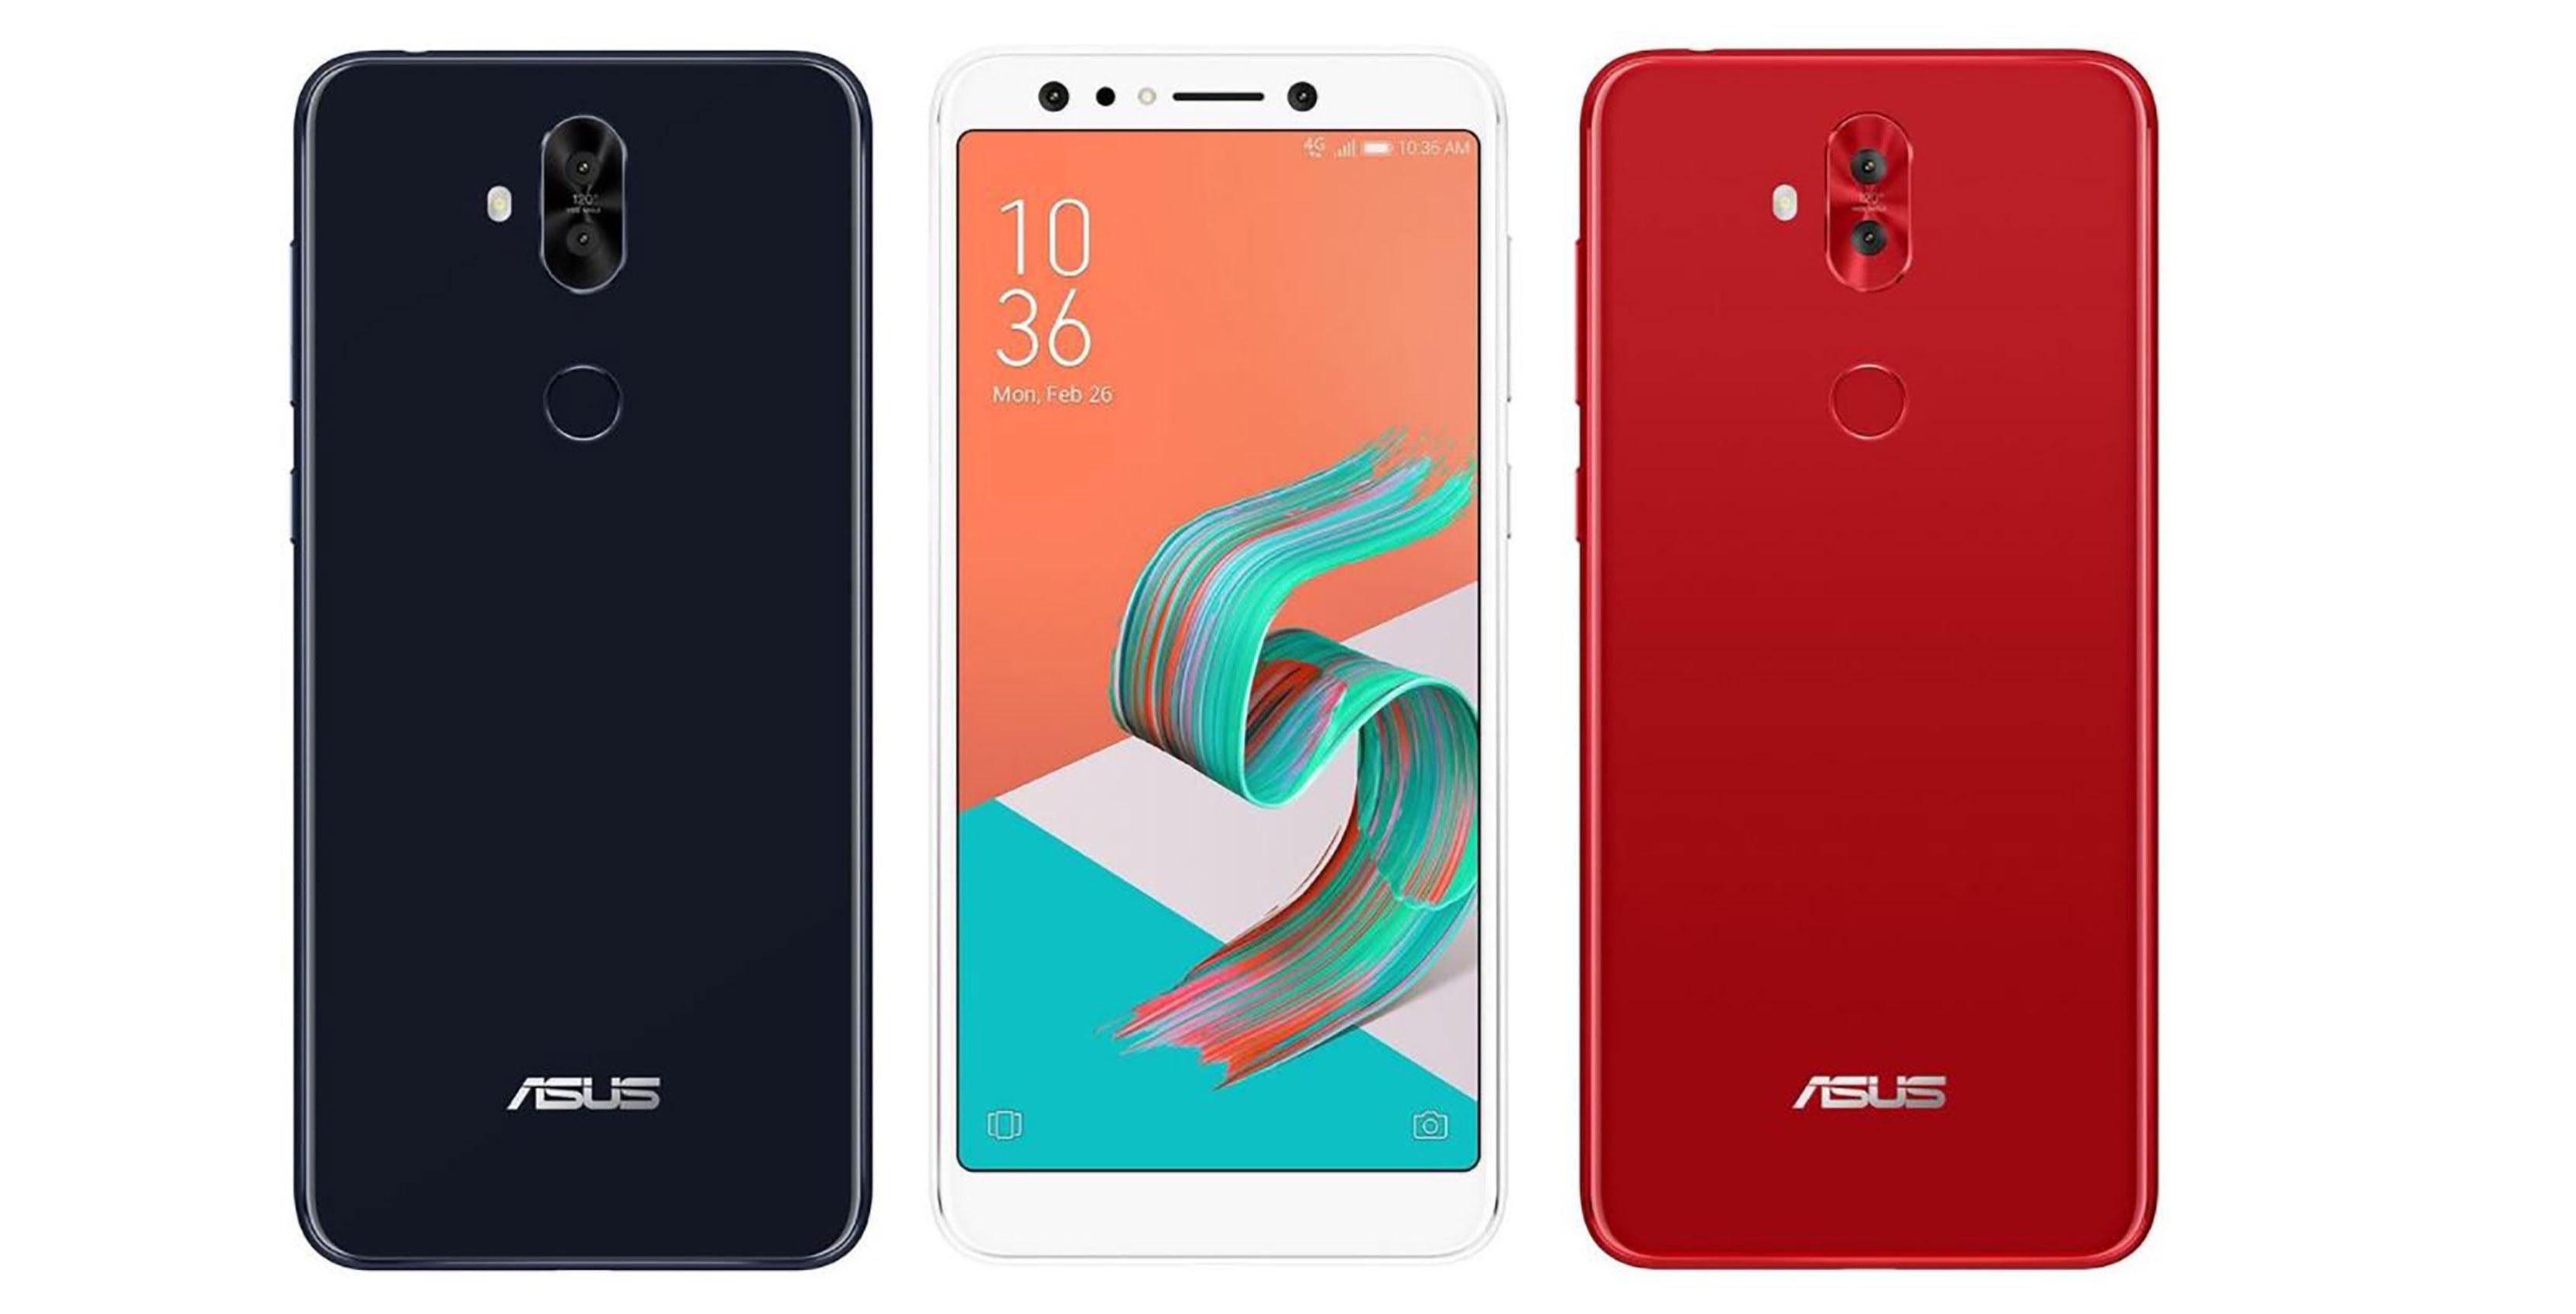 Asus ZenFone 5 Lite leaked by Evan Blass